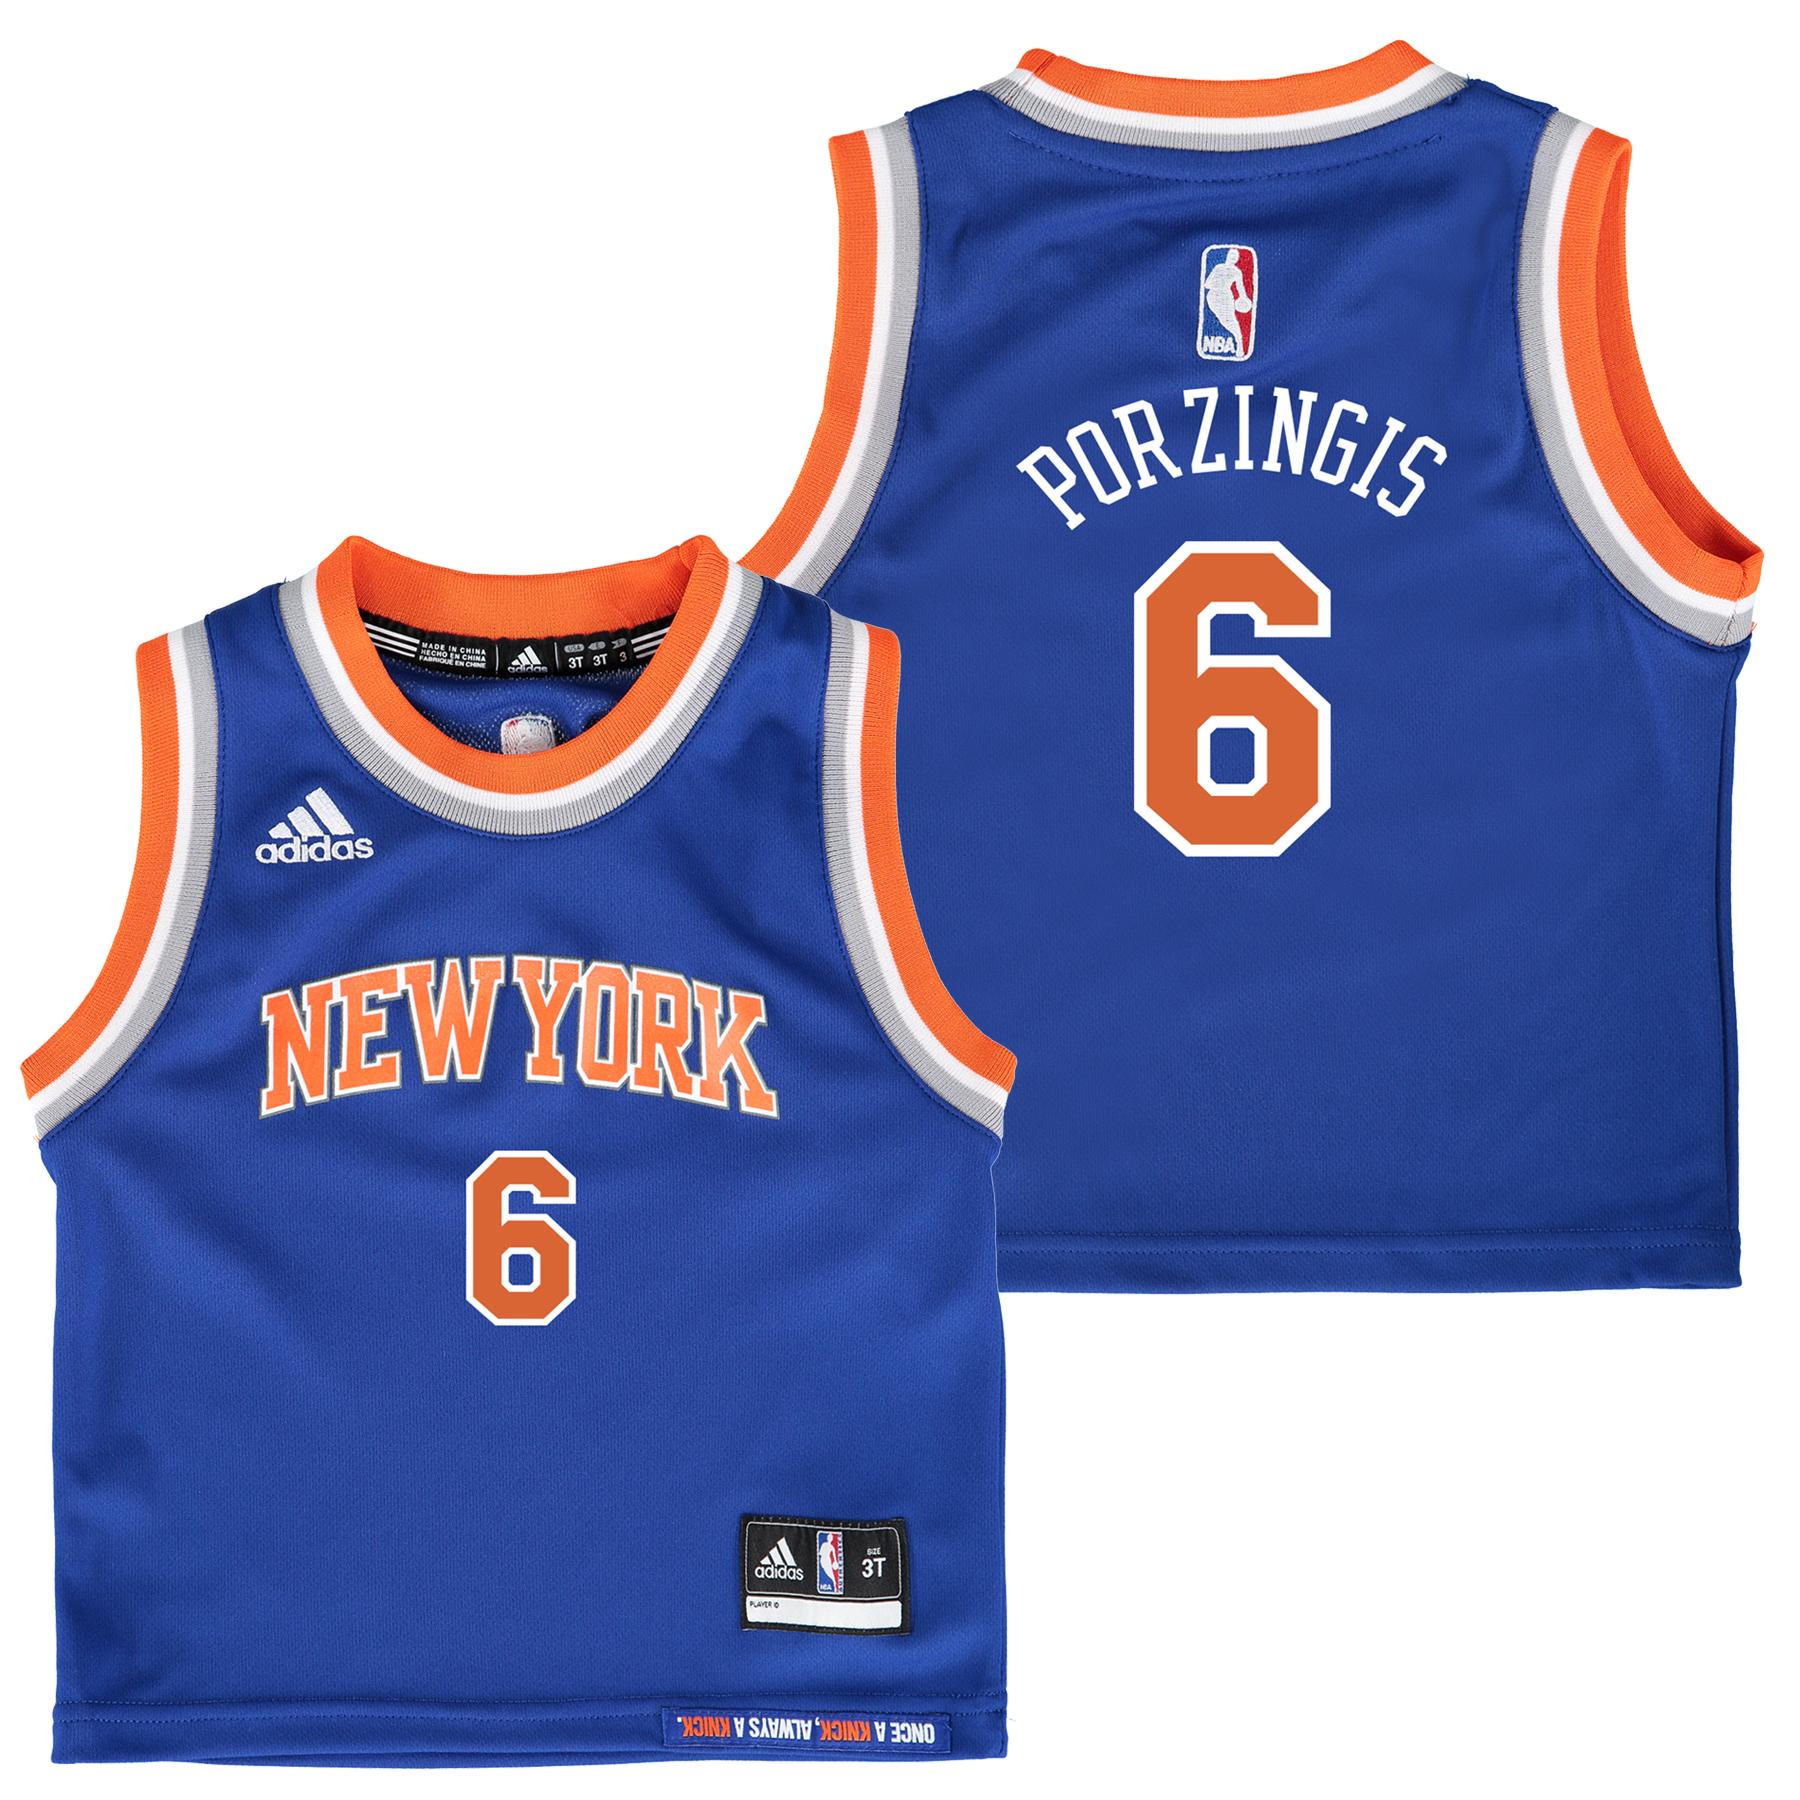 New York Knicks Road Replica Jersey - Kristaps Porzingis - Toddler